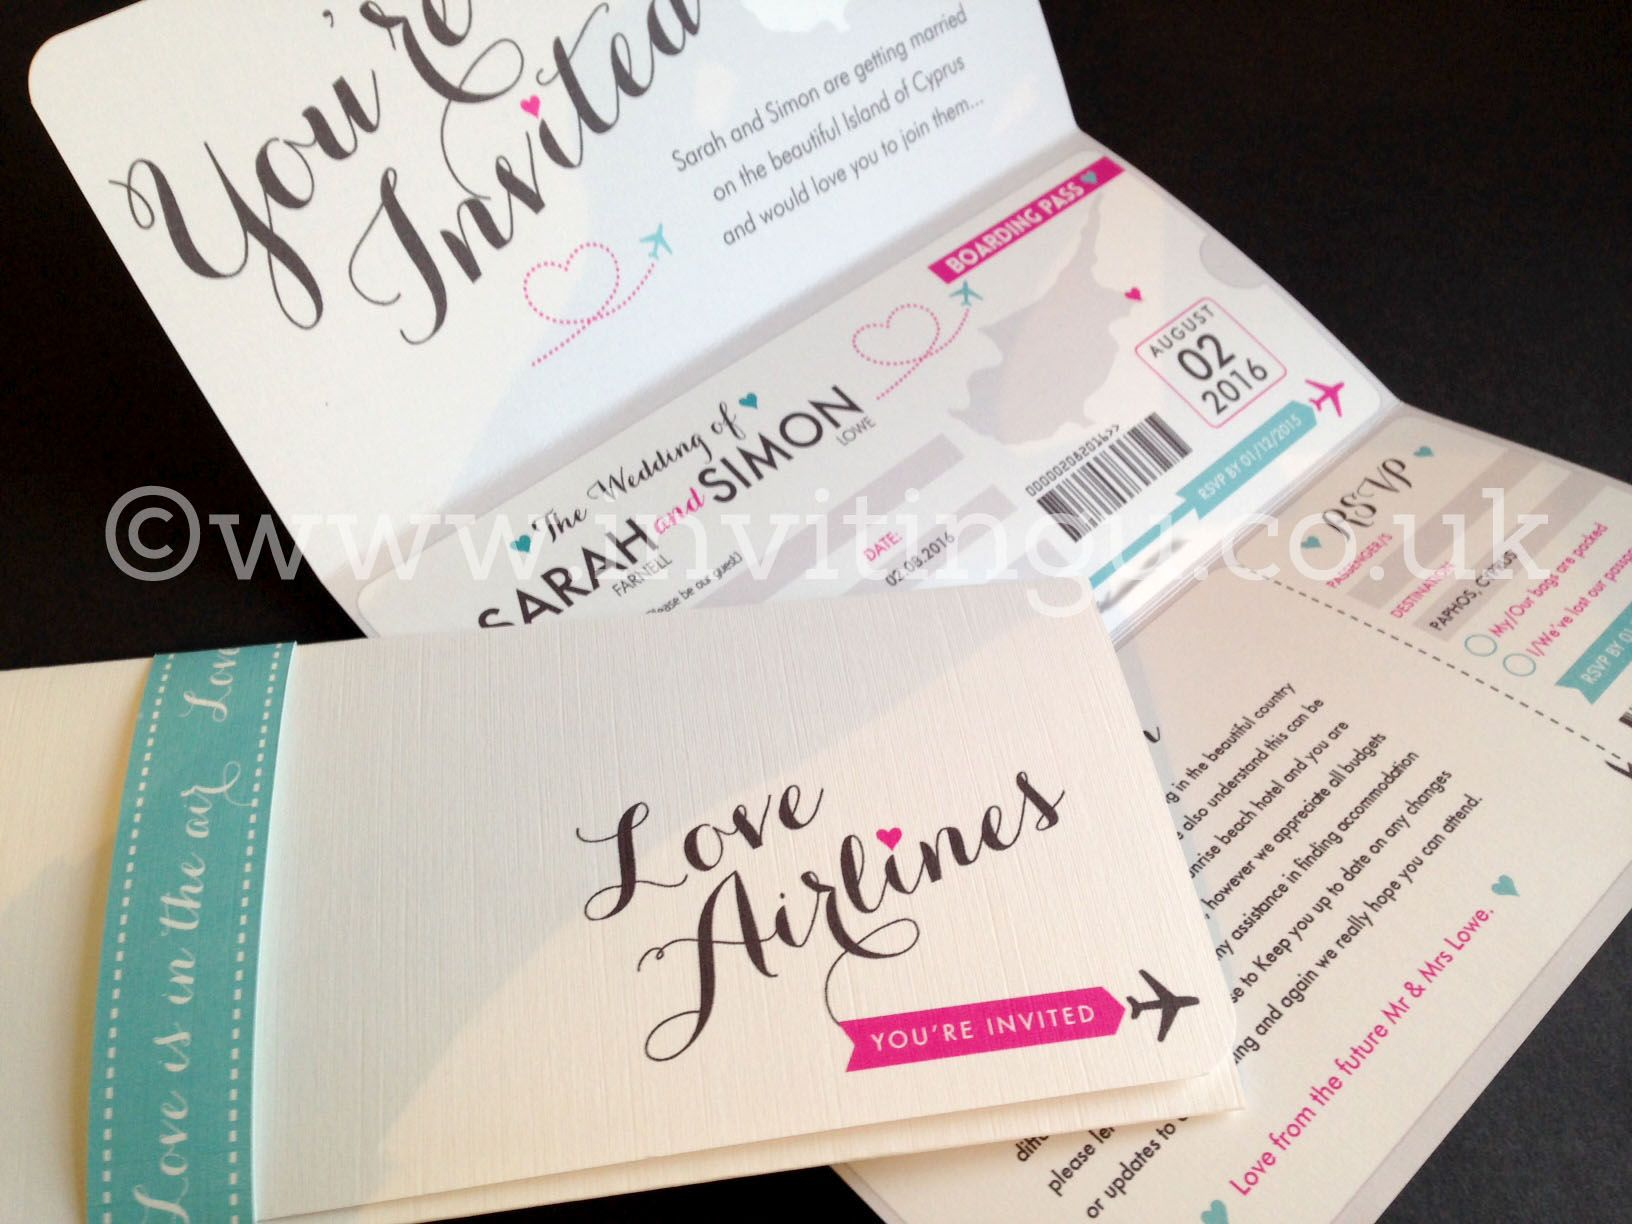 Budget Destination Wedding invites ©www.invitingu.co.uk ...